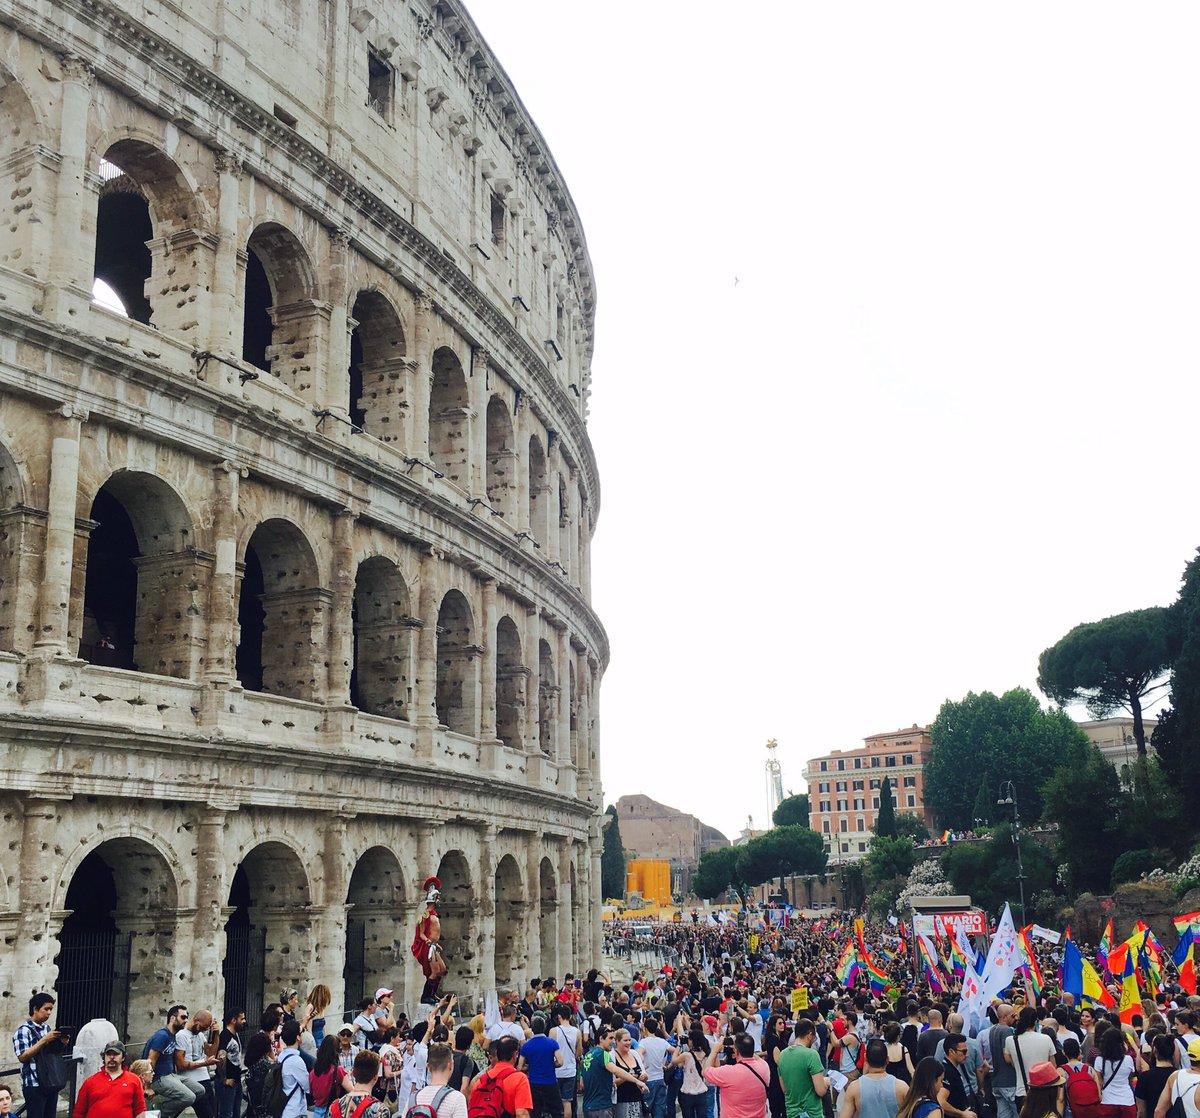 Che pride! #RomaPride #pride #loveislove<br>http://pic.twitter.com/G3lWuwPDIS